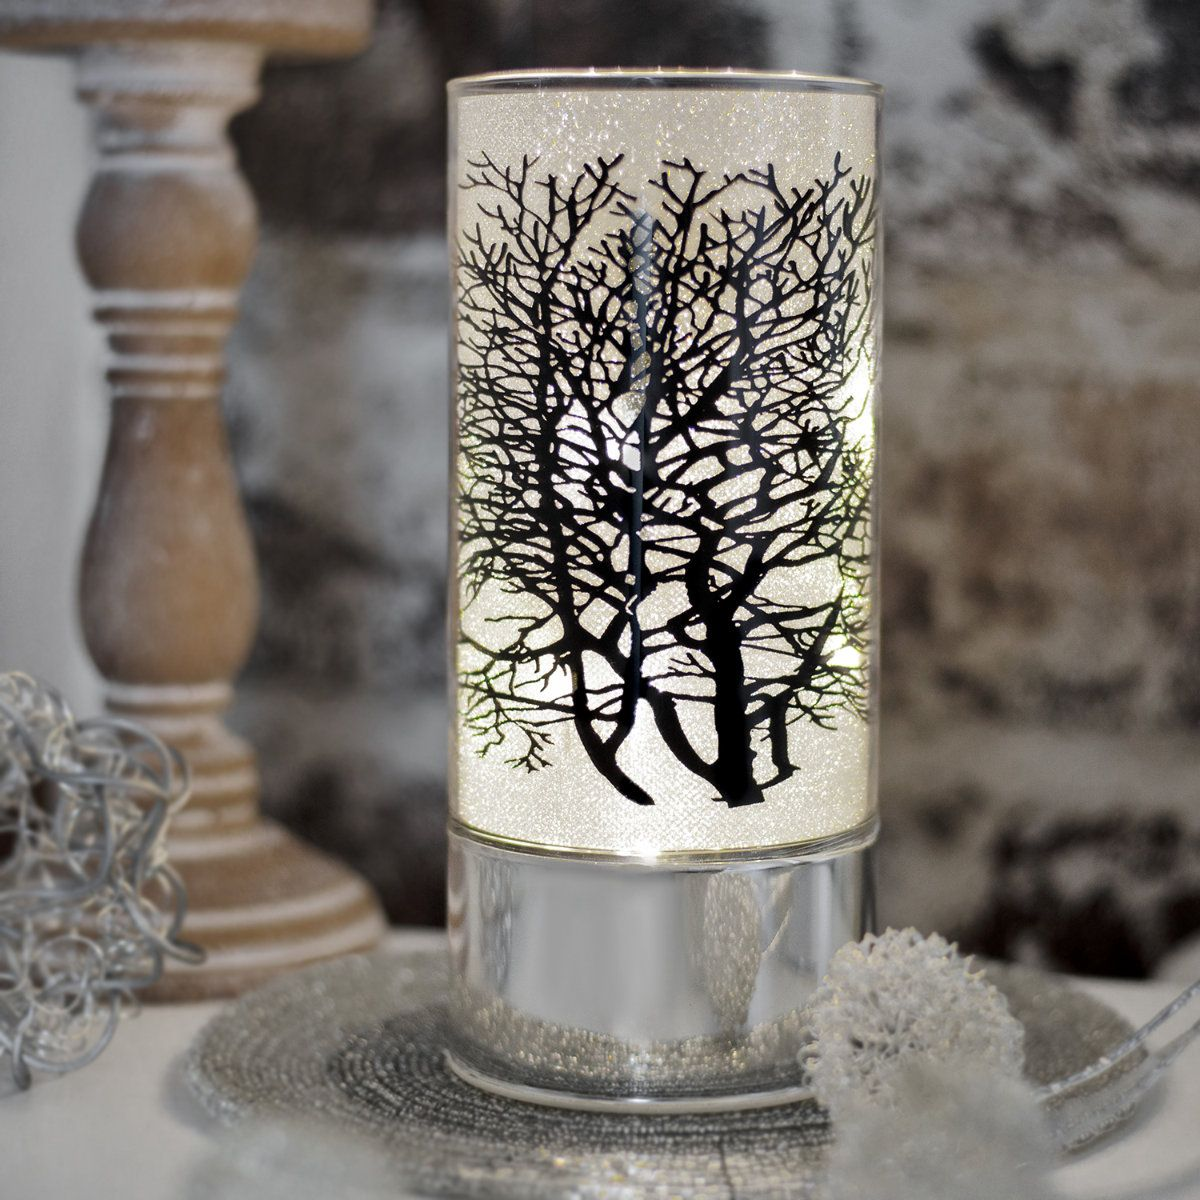 Led Lampe Glas Rohre Auf Sockel Baummotiv Stimmungslicht Leuchte Led Lampe Led Glas Led